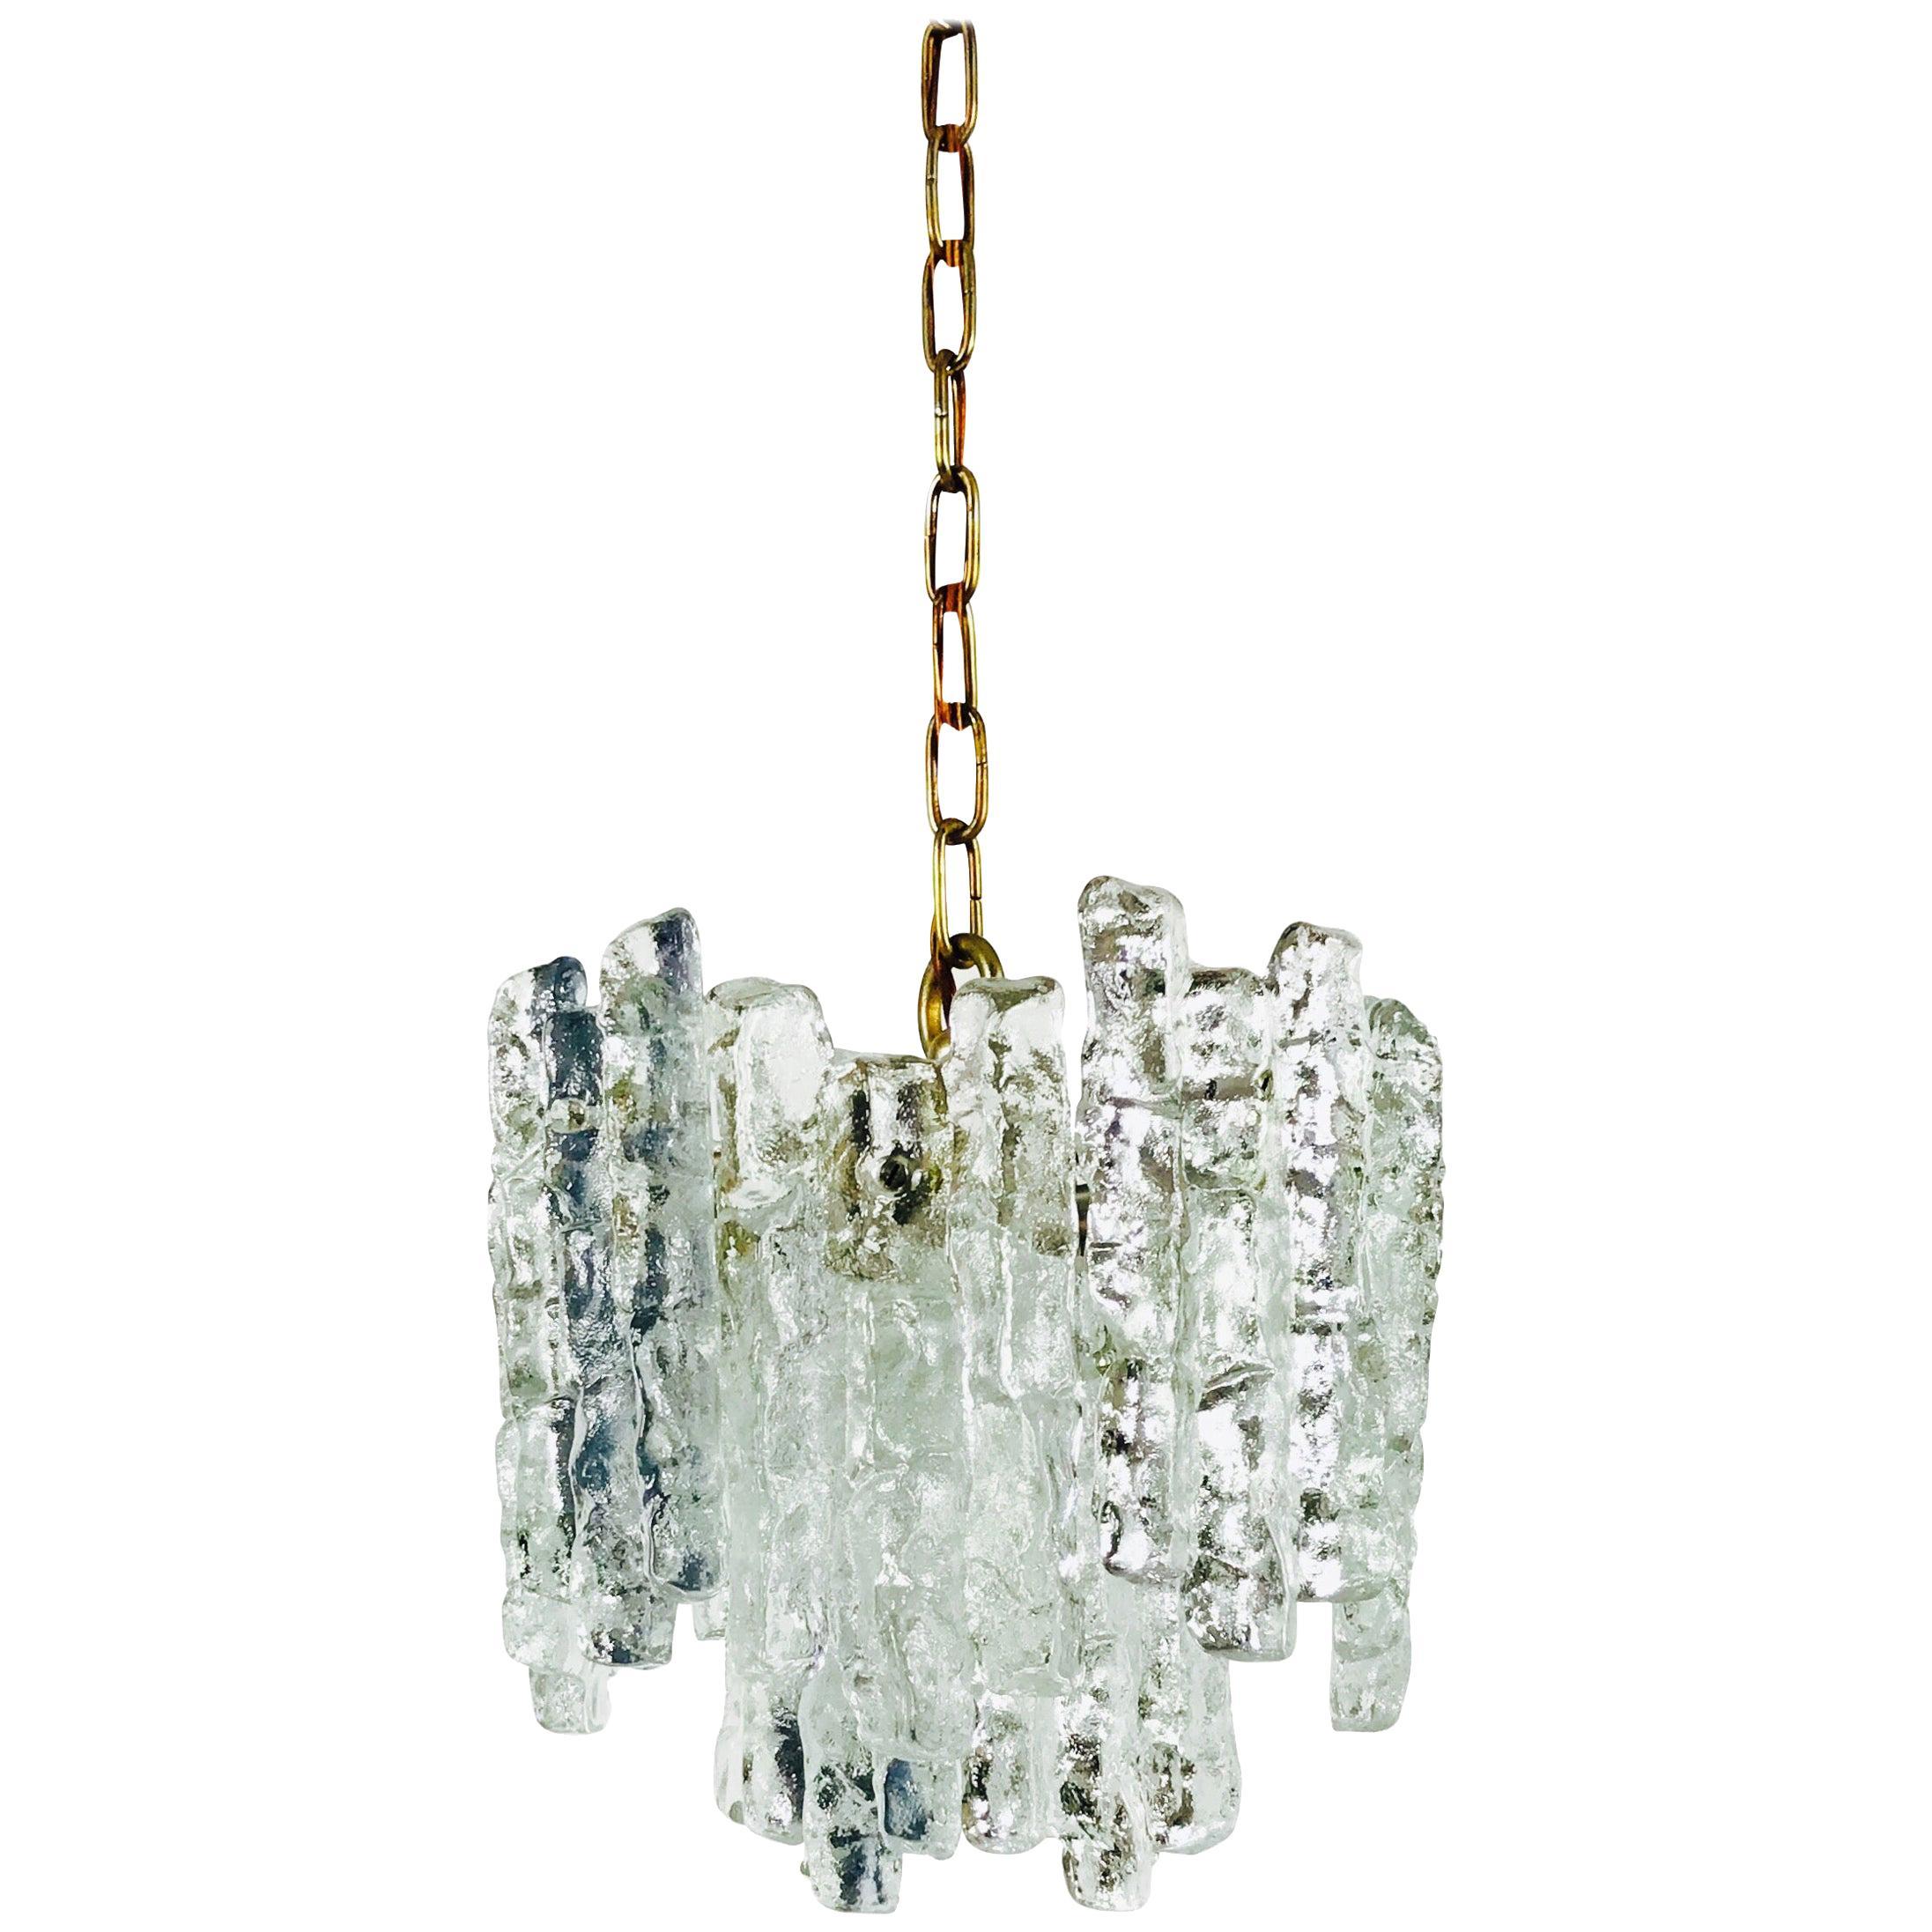 Midcentury Ice Crystal Glass Pendant Light or Chandelier by Kalmar, circa 1960s